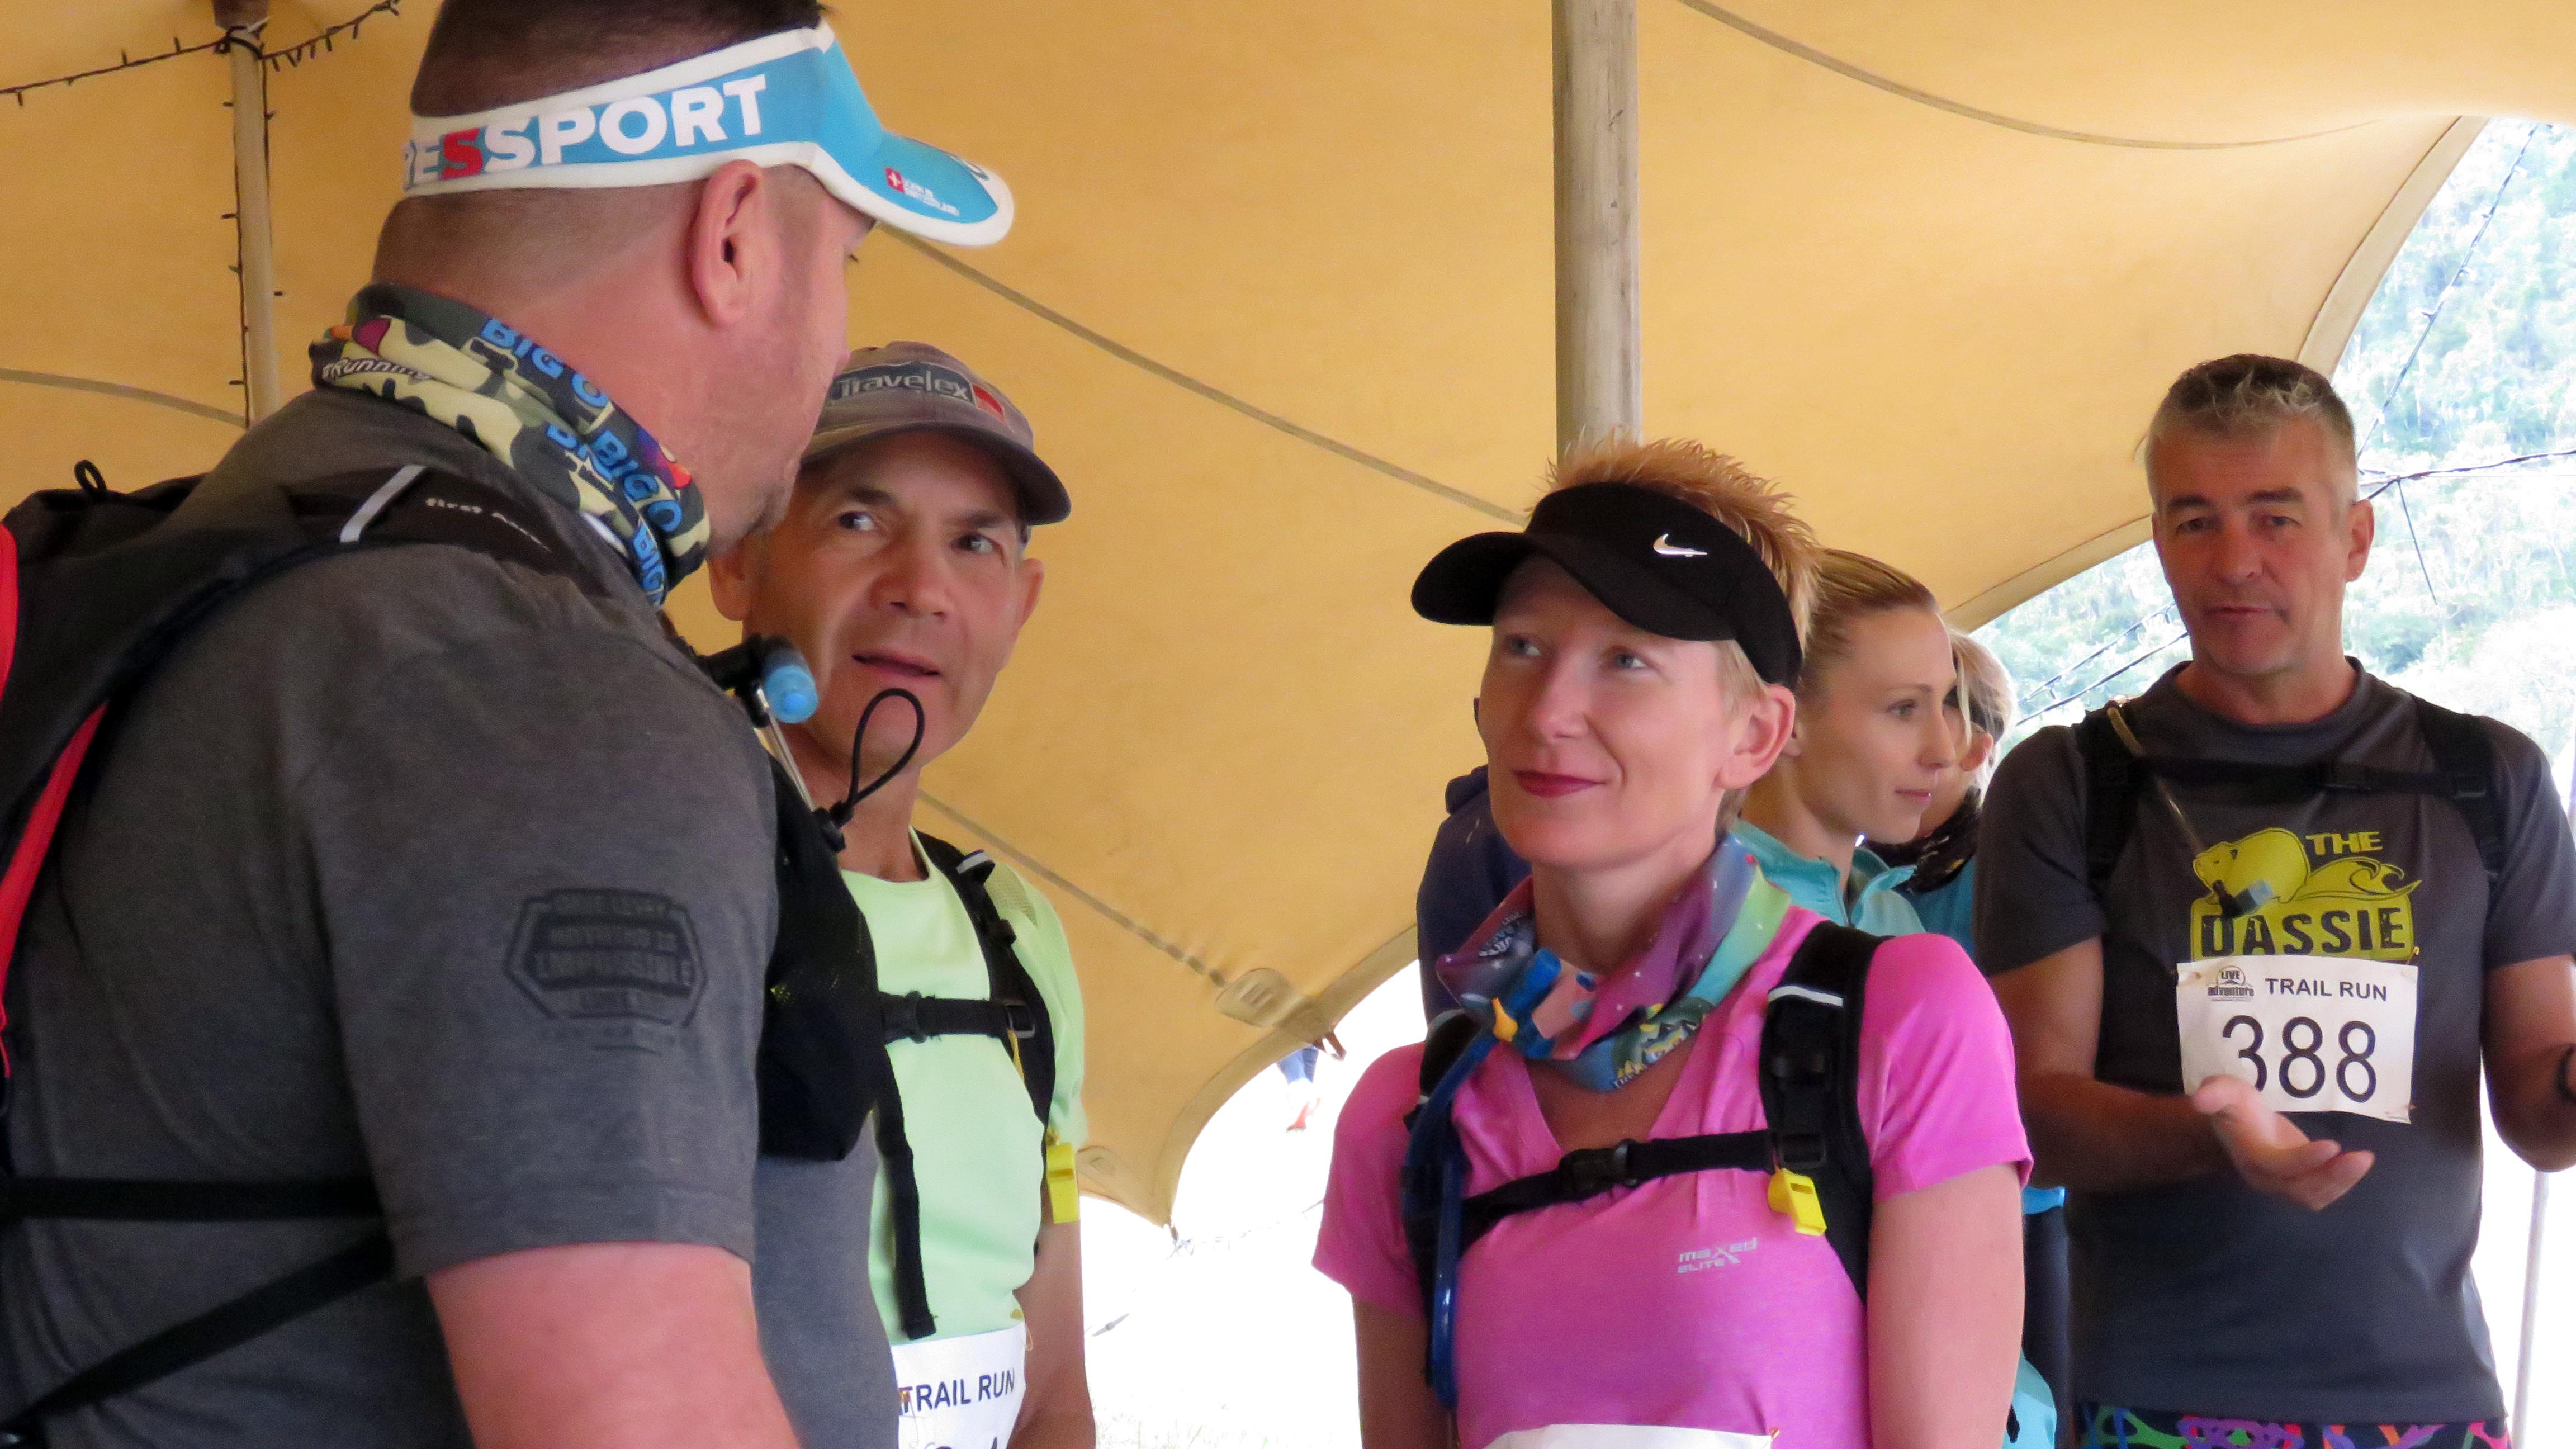 hayterdale trailrun 2018-08-05  (13)